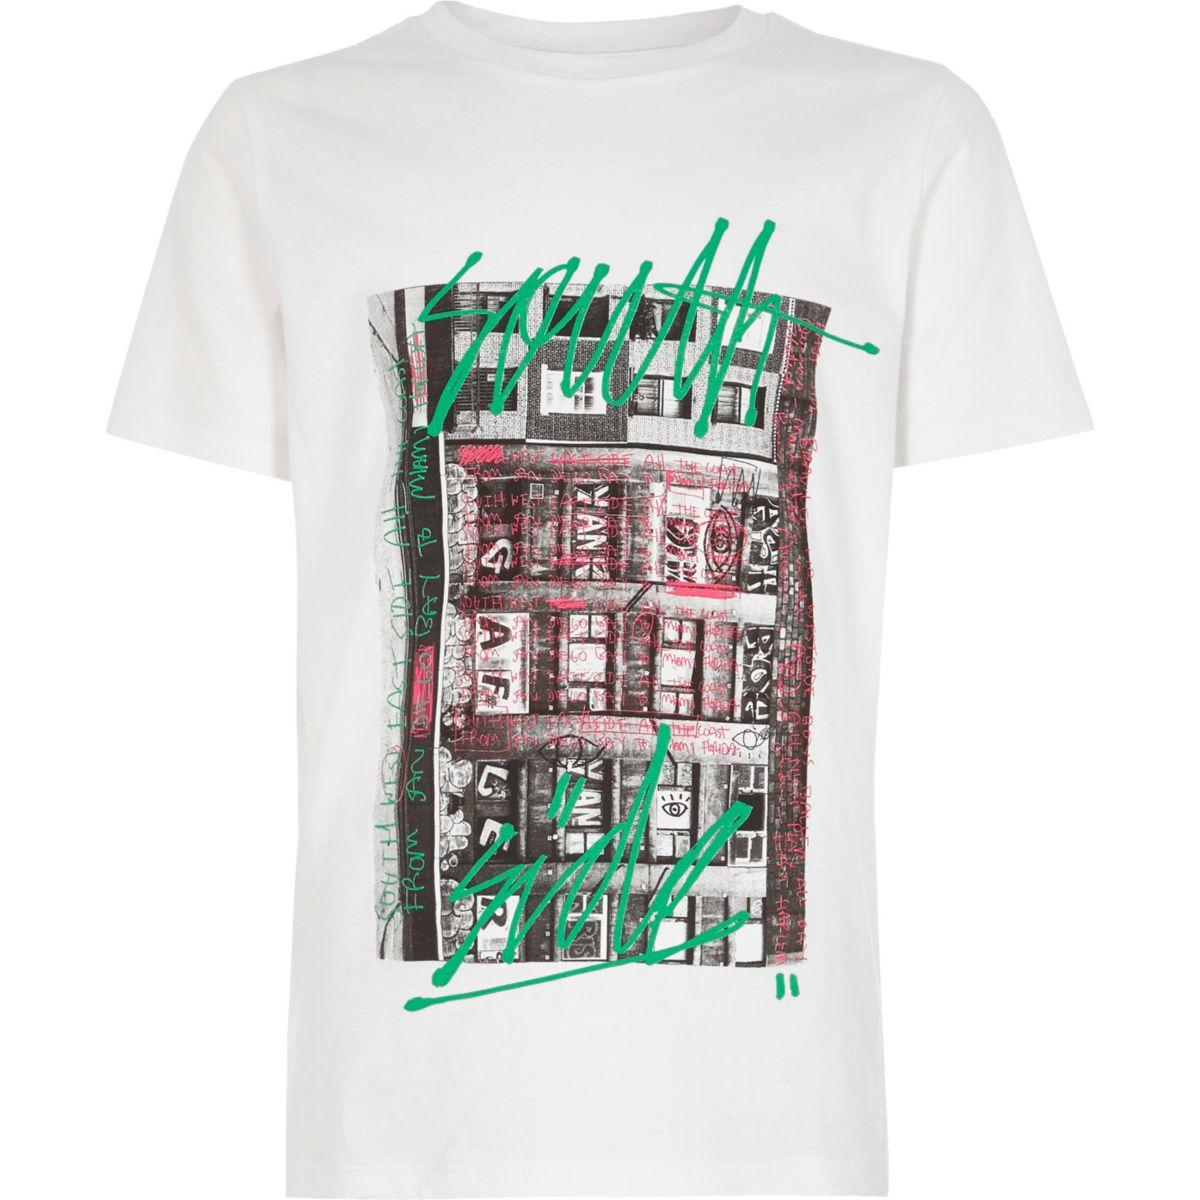 Boys white 'South Side' city print T-shirt